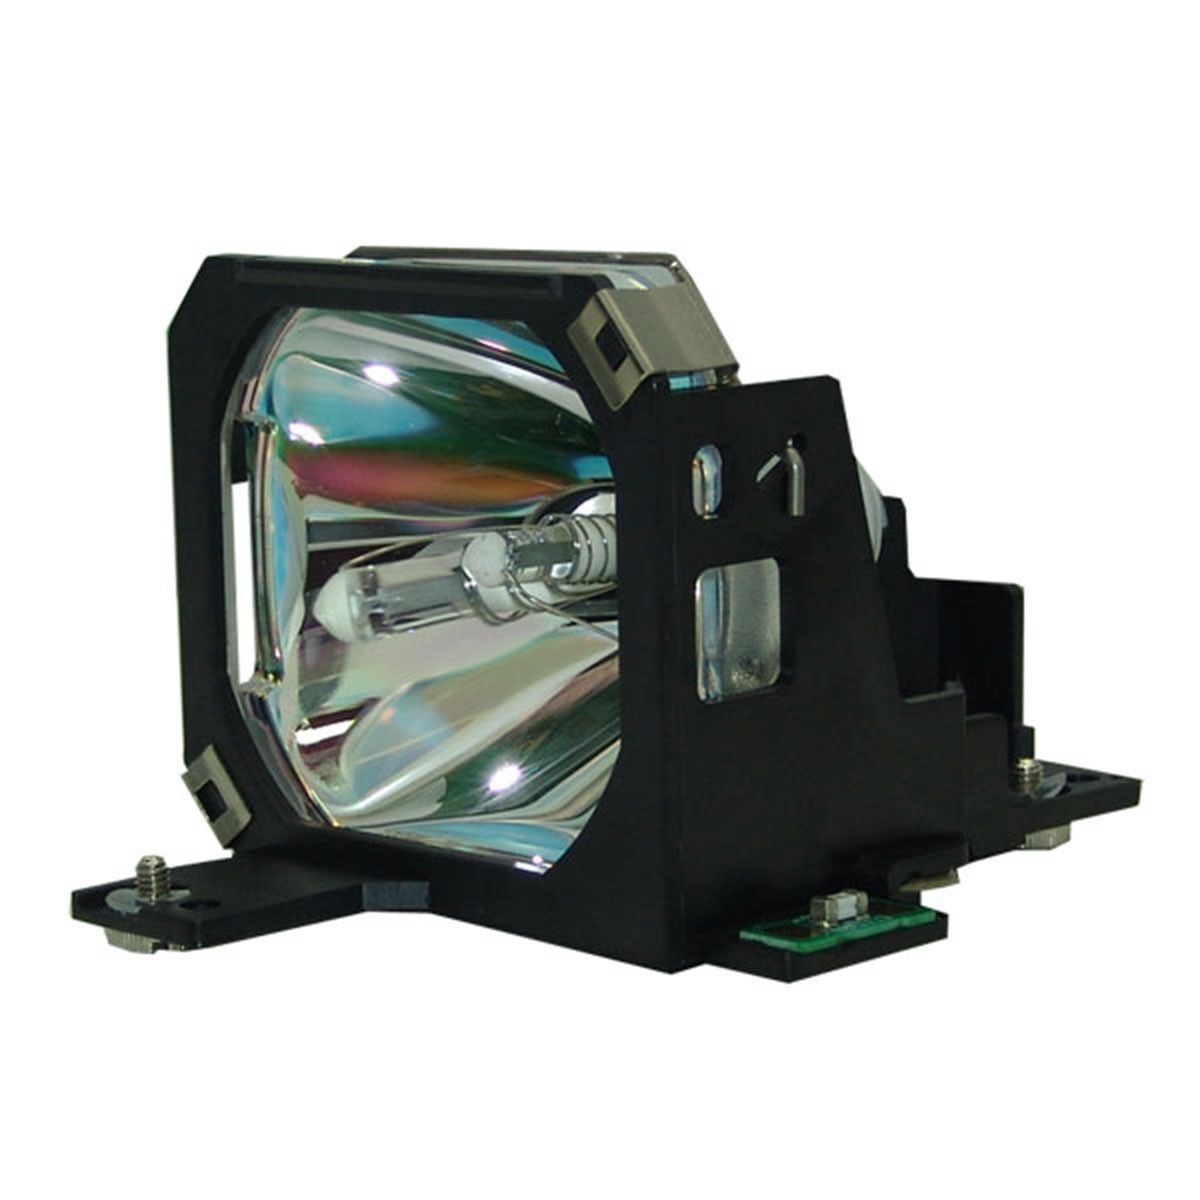 Projector Lamp Bulb ELPLP07 V13H010L07 for Epson EMP-5550 EMP-7550 Powerlite 5550 / Powerlite 7550 with housing elplp07 projector lamp with housing for epson emp 5500 emp 5500c emp 5550 emp 5550c emp 7500 emp 7500c emp 7550